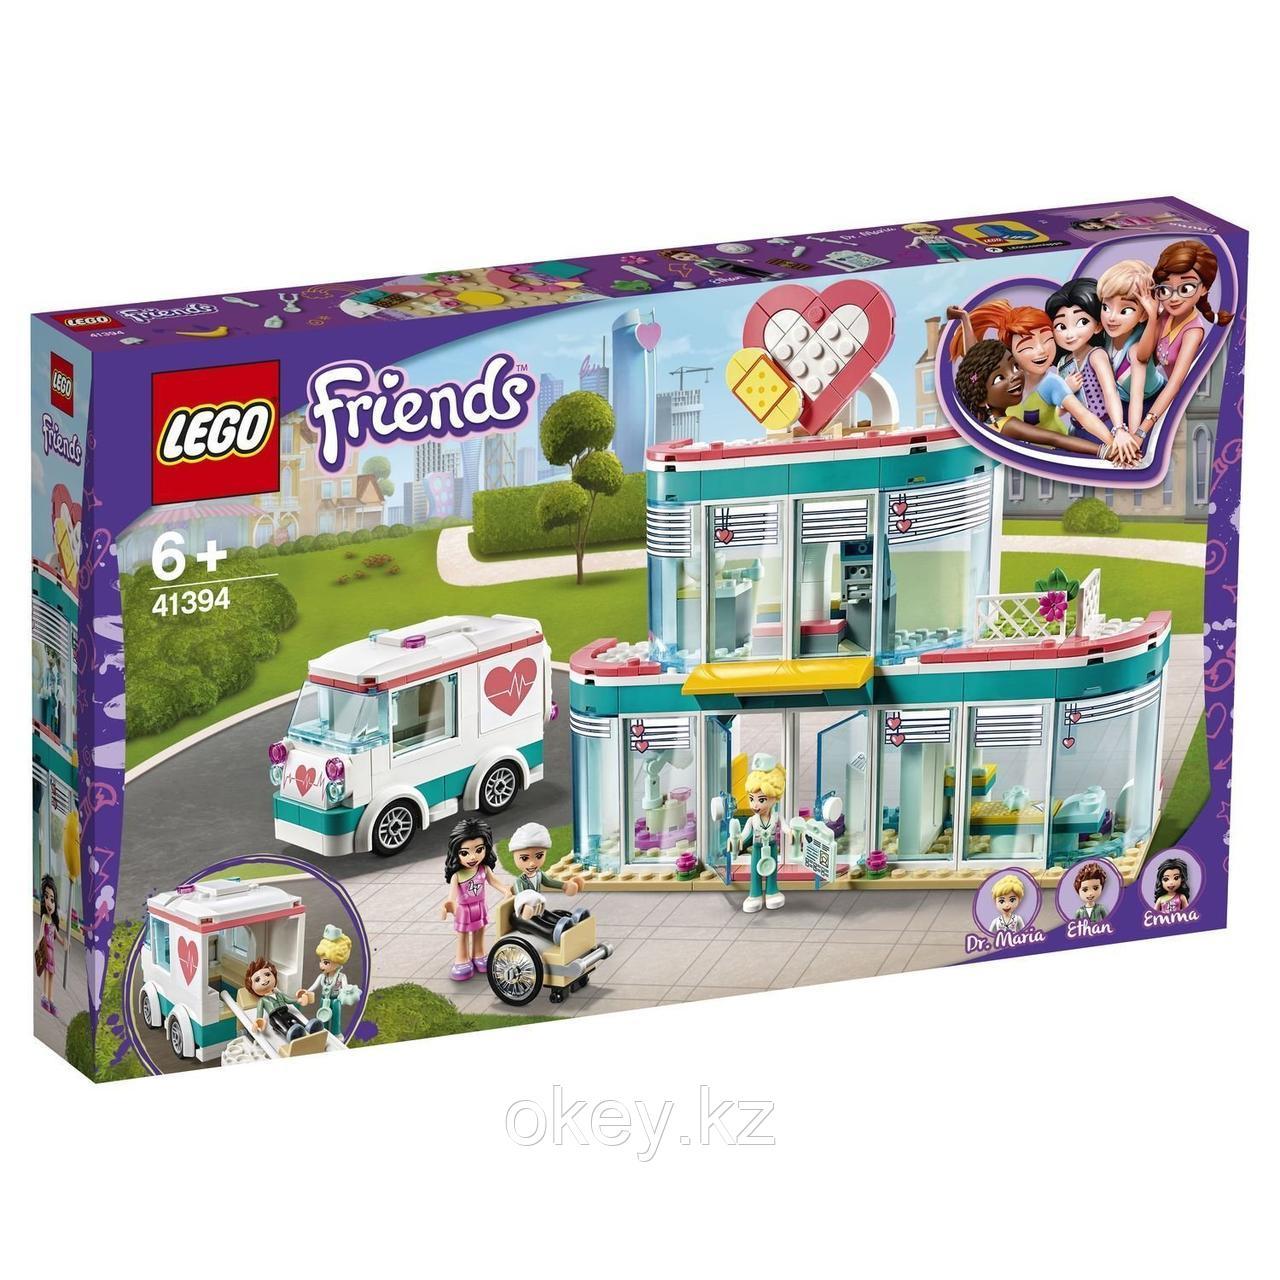 LEGO Friends: Городская больница Хартлейк Сити 41394